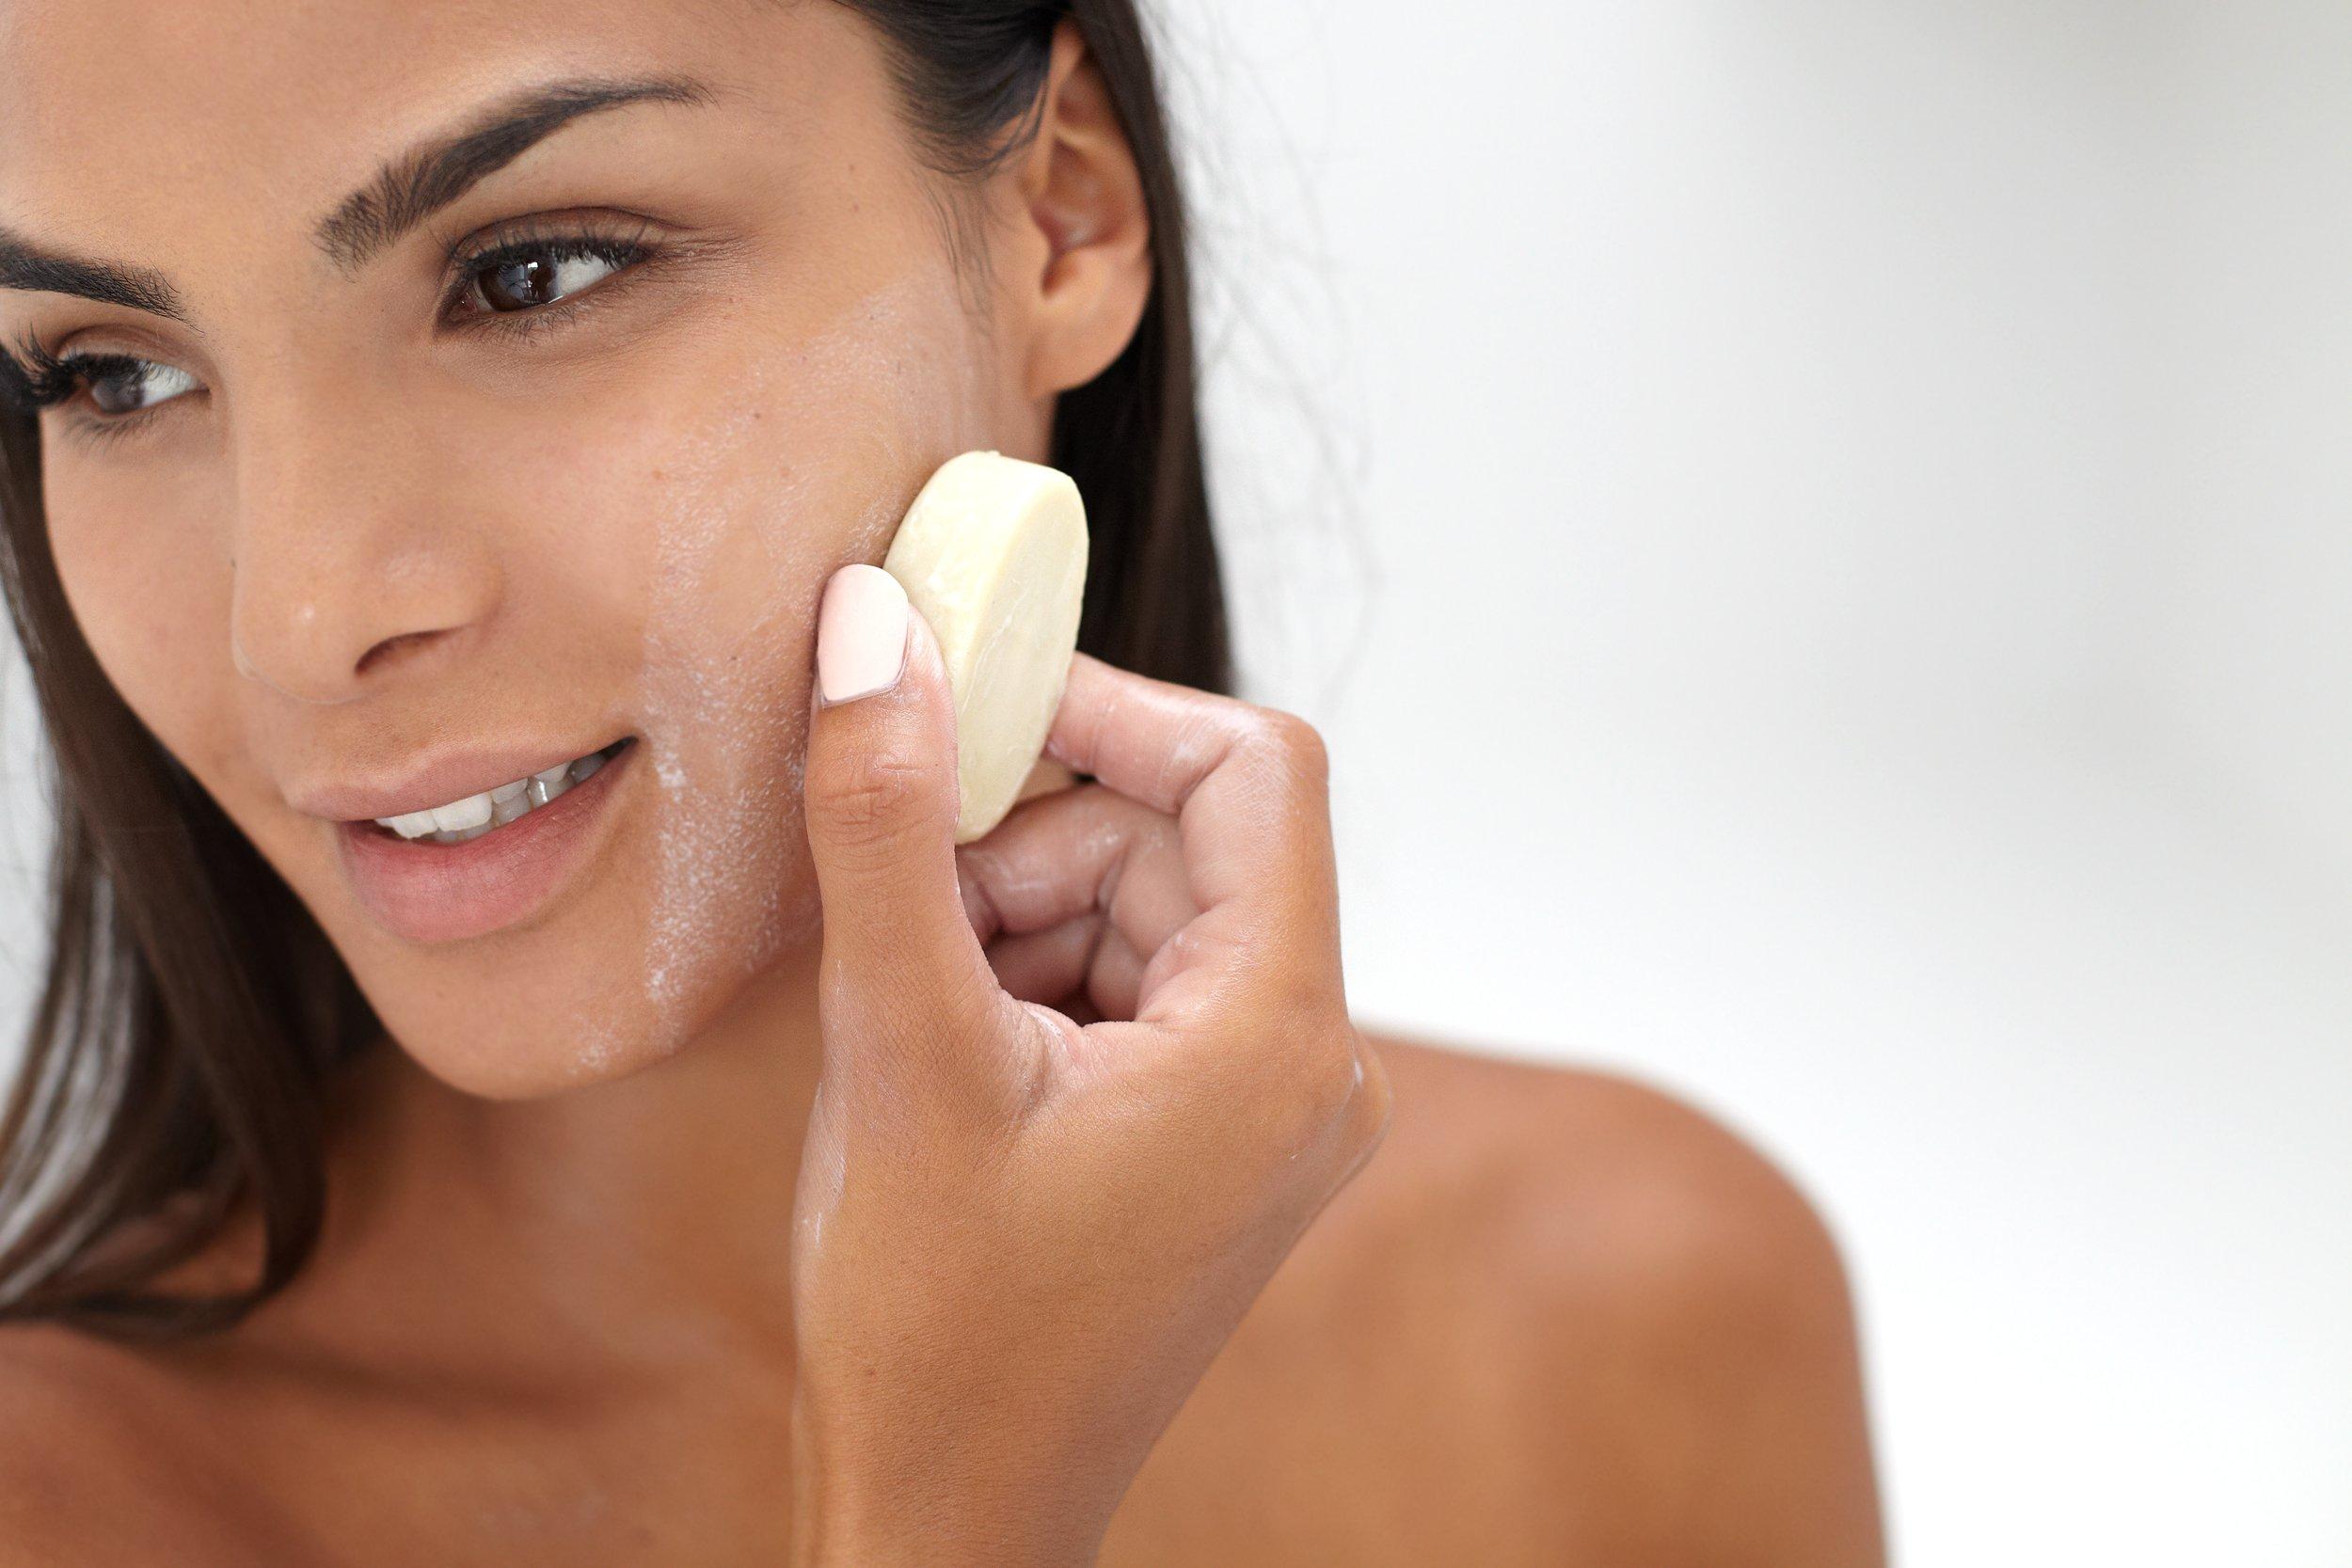 Ethique Face Cleanser & Makeup Remover, SuperStar! 2.47 oz by Ethique (Image #8)